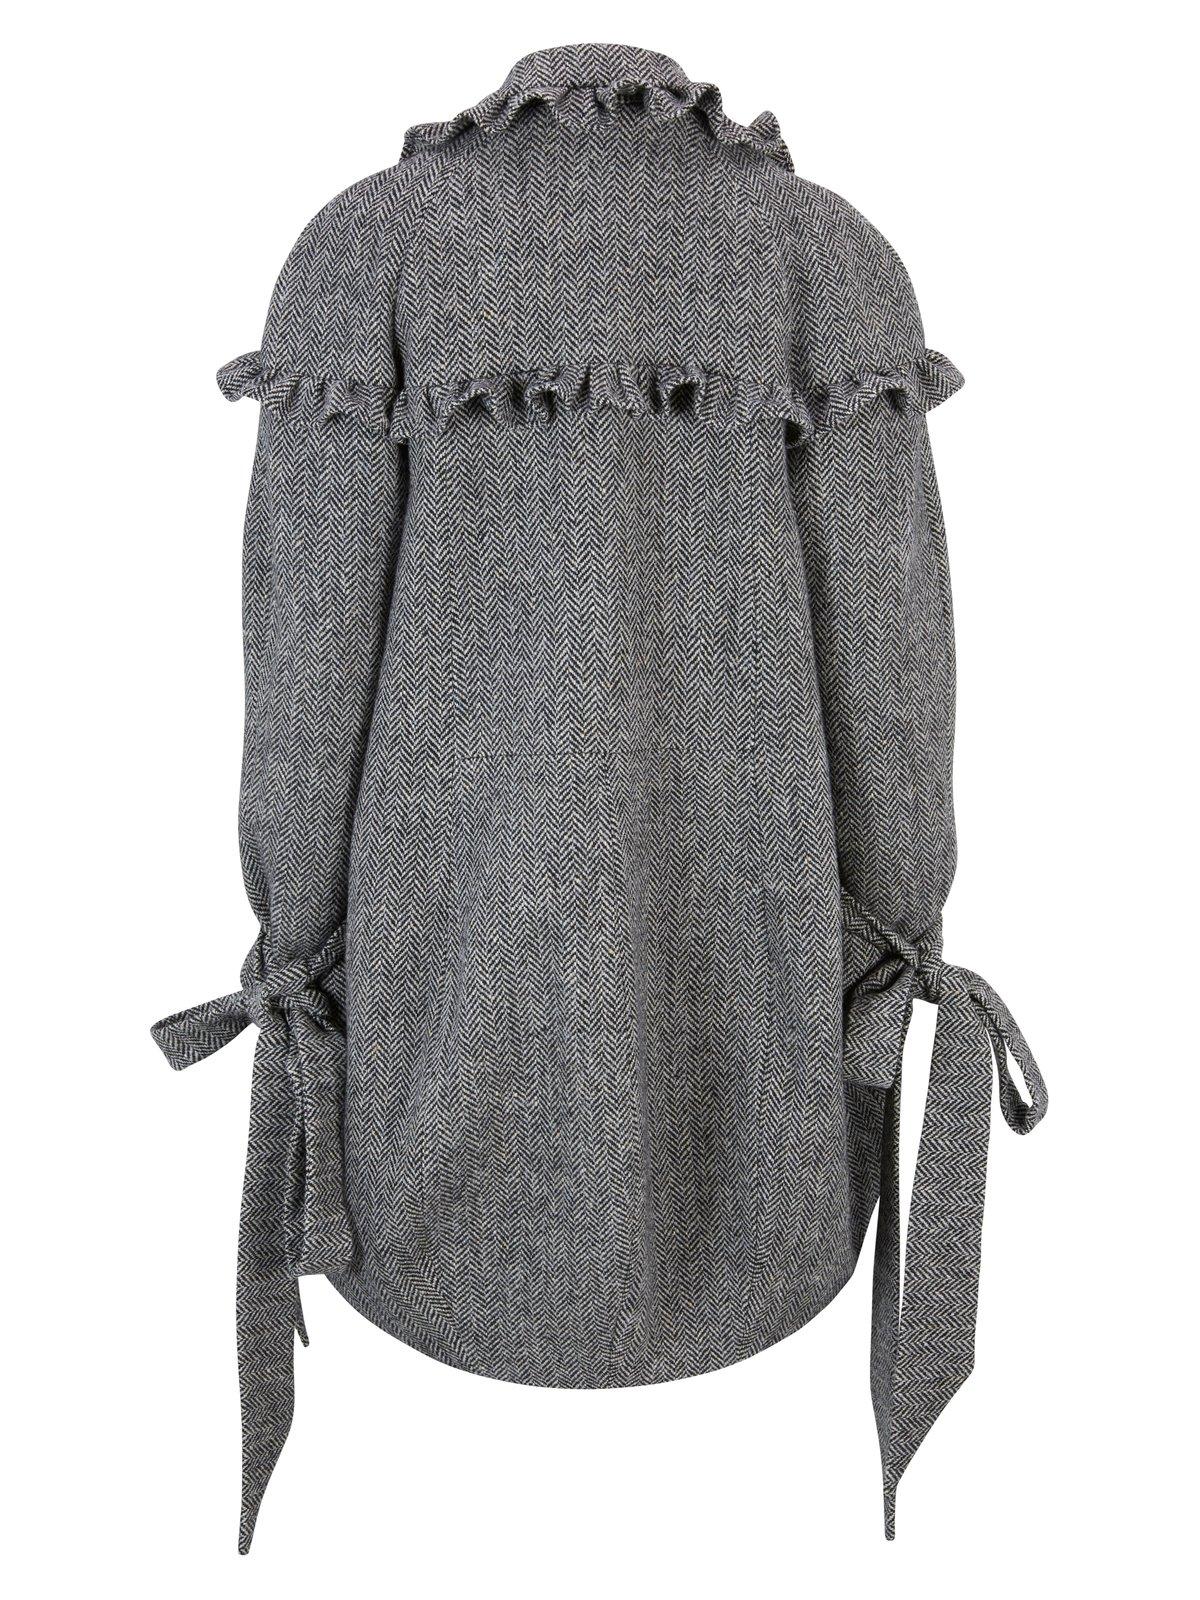 Image of Irish Tweed Pleated Coat